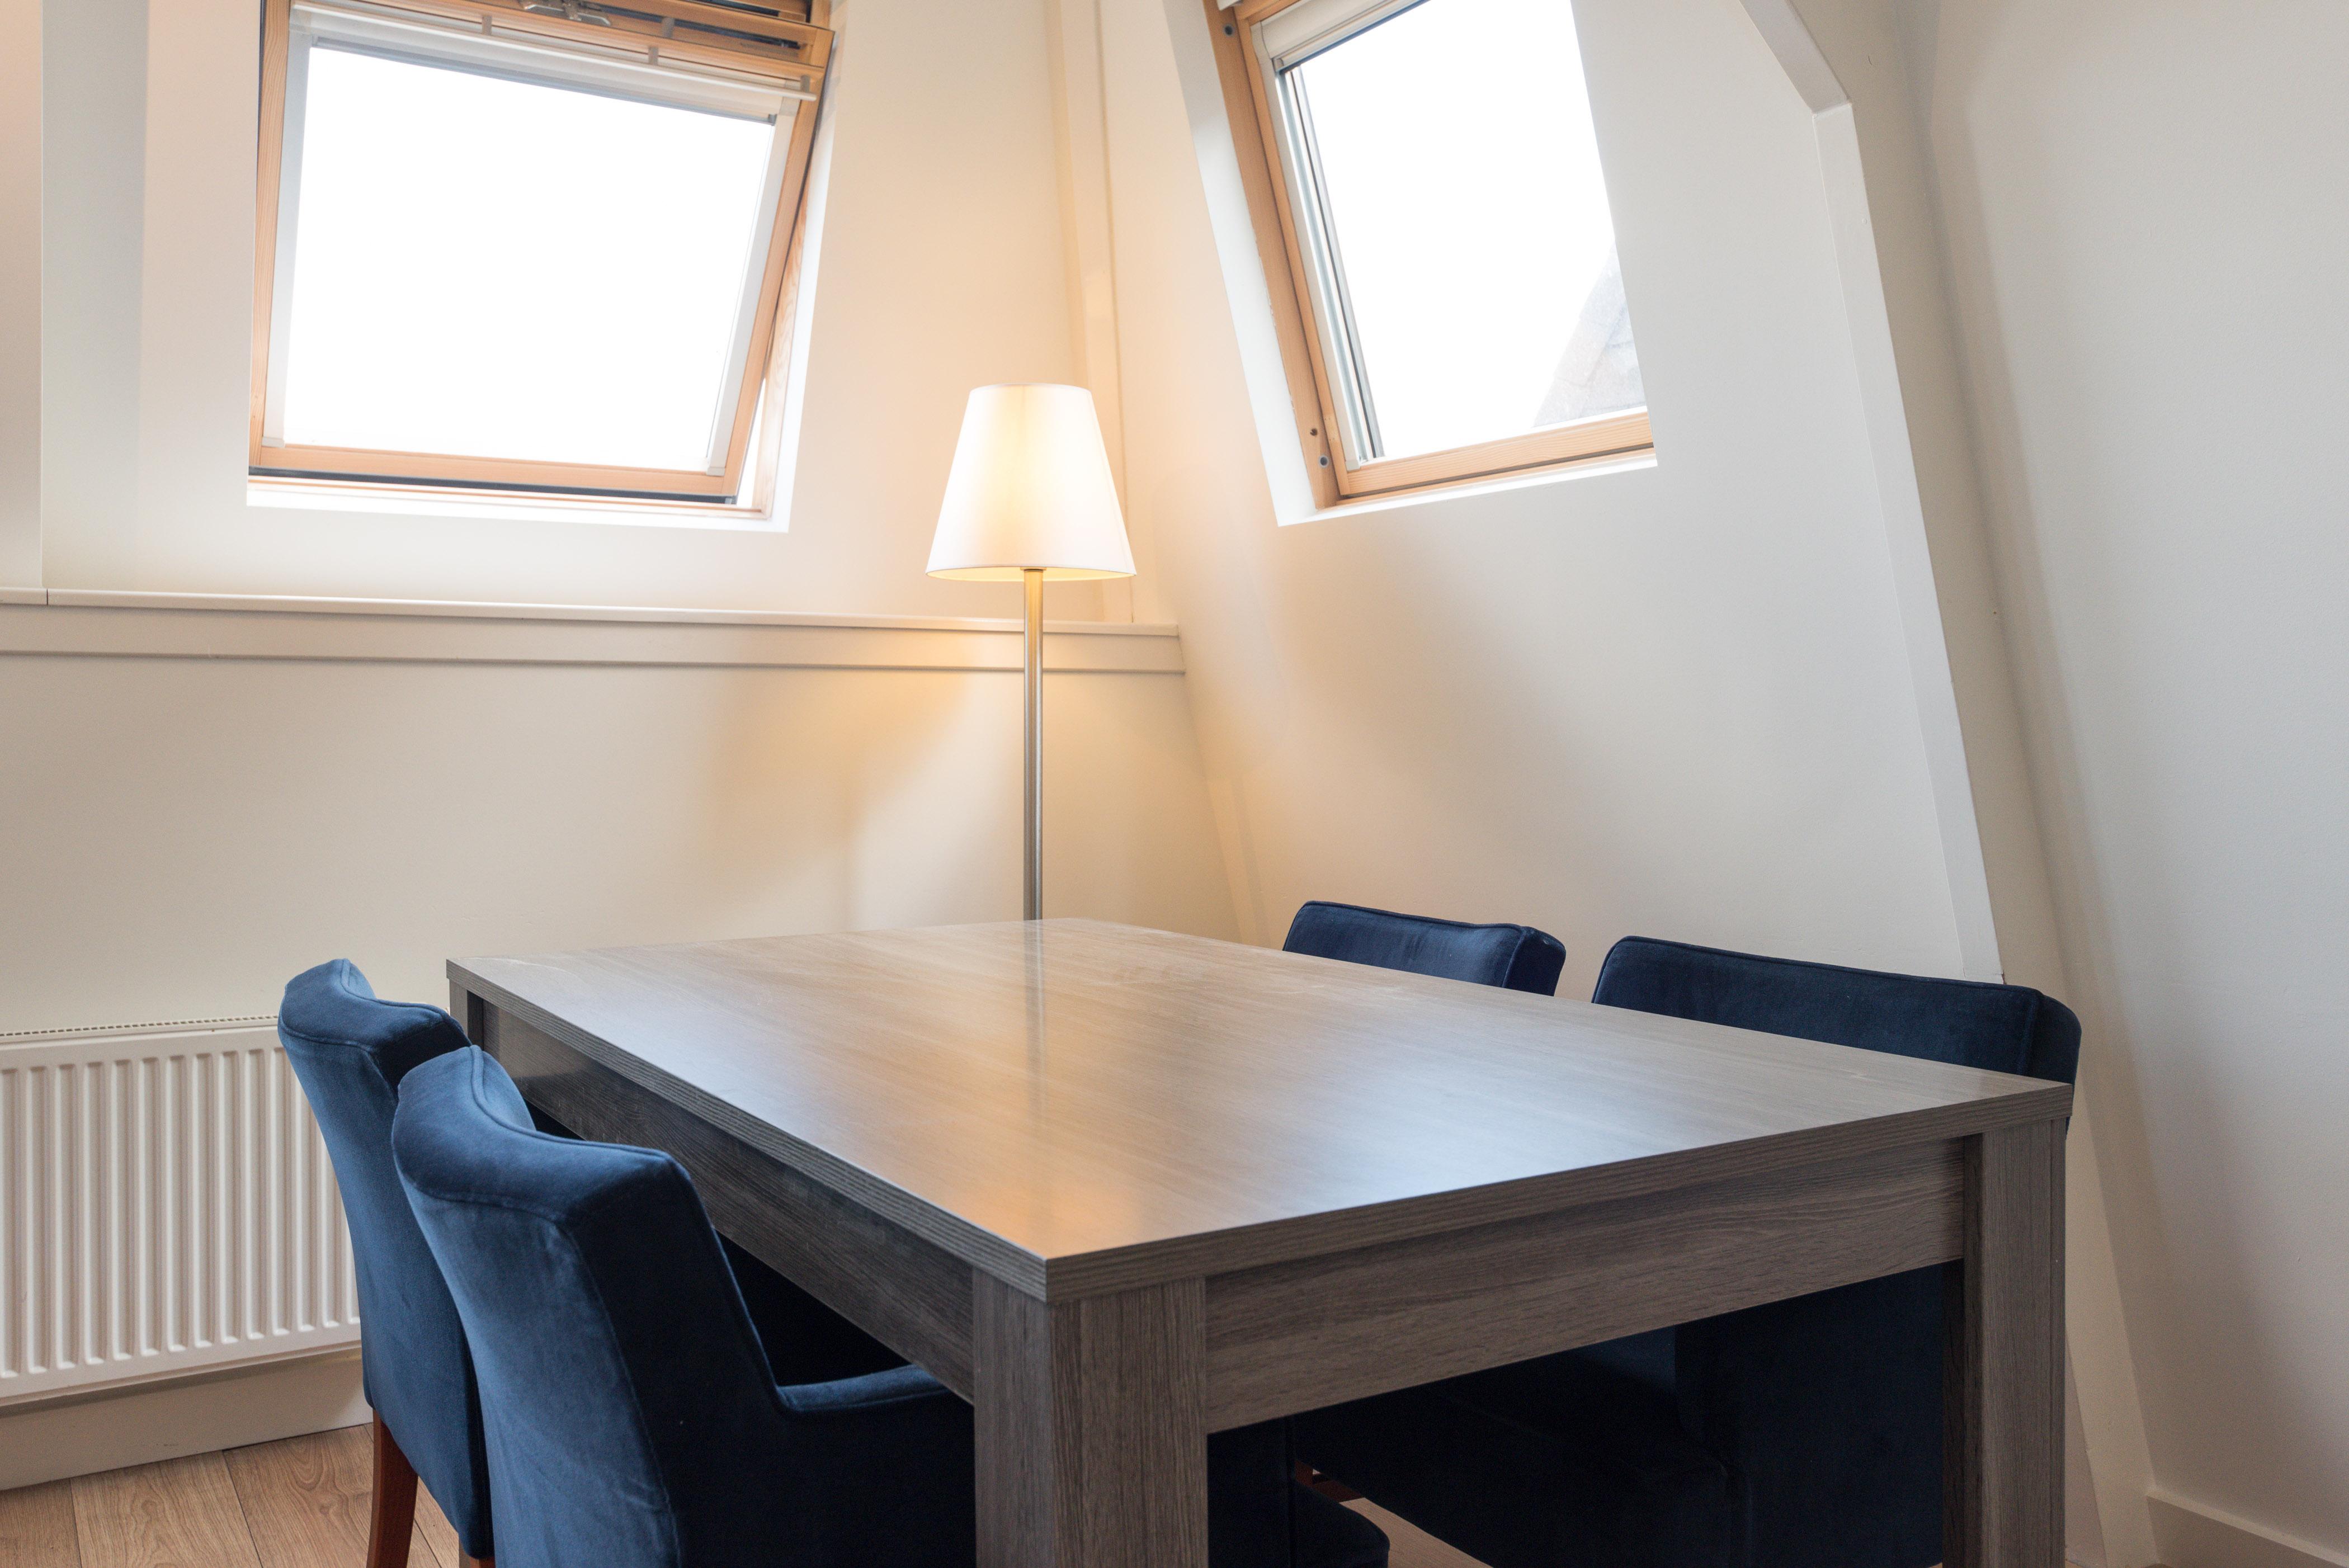 Apartment Amsterdam Apartments Penthouse Building 2 photo 20332782